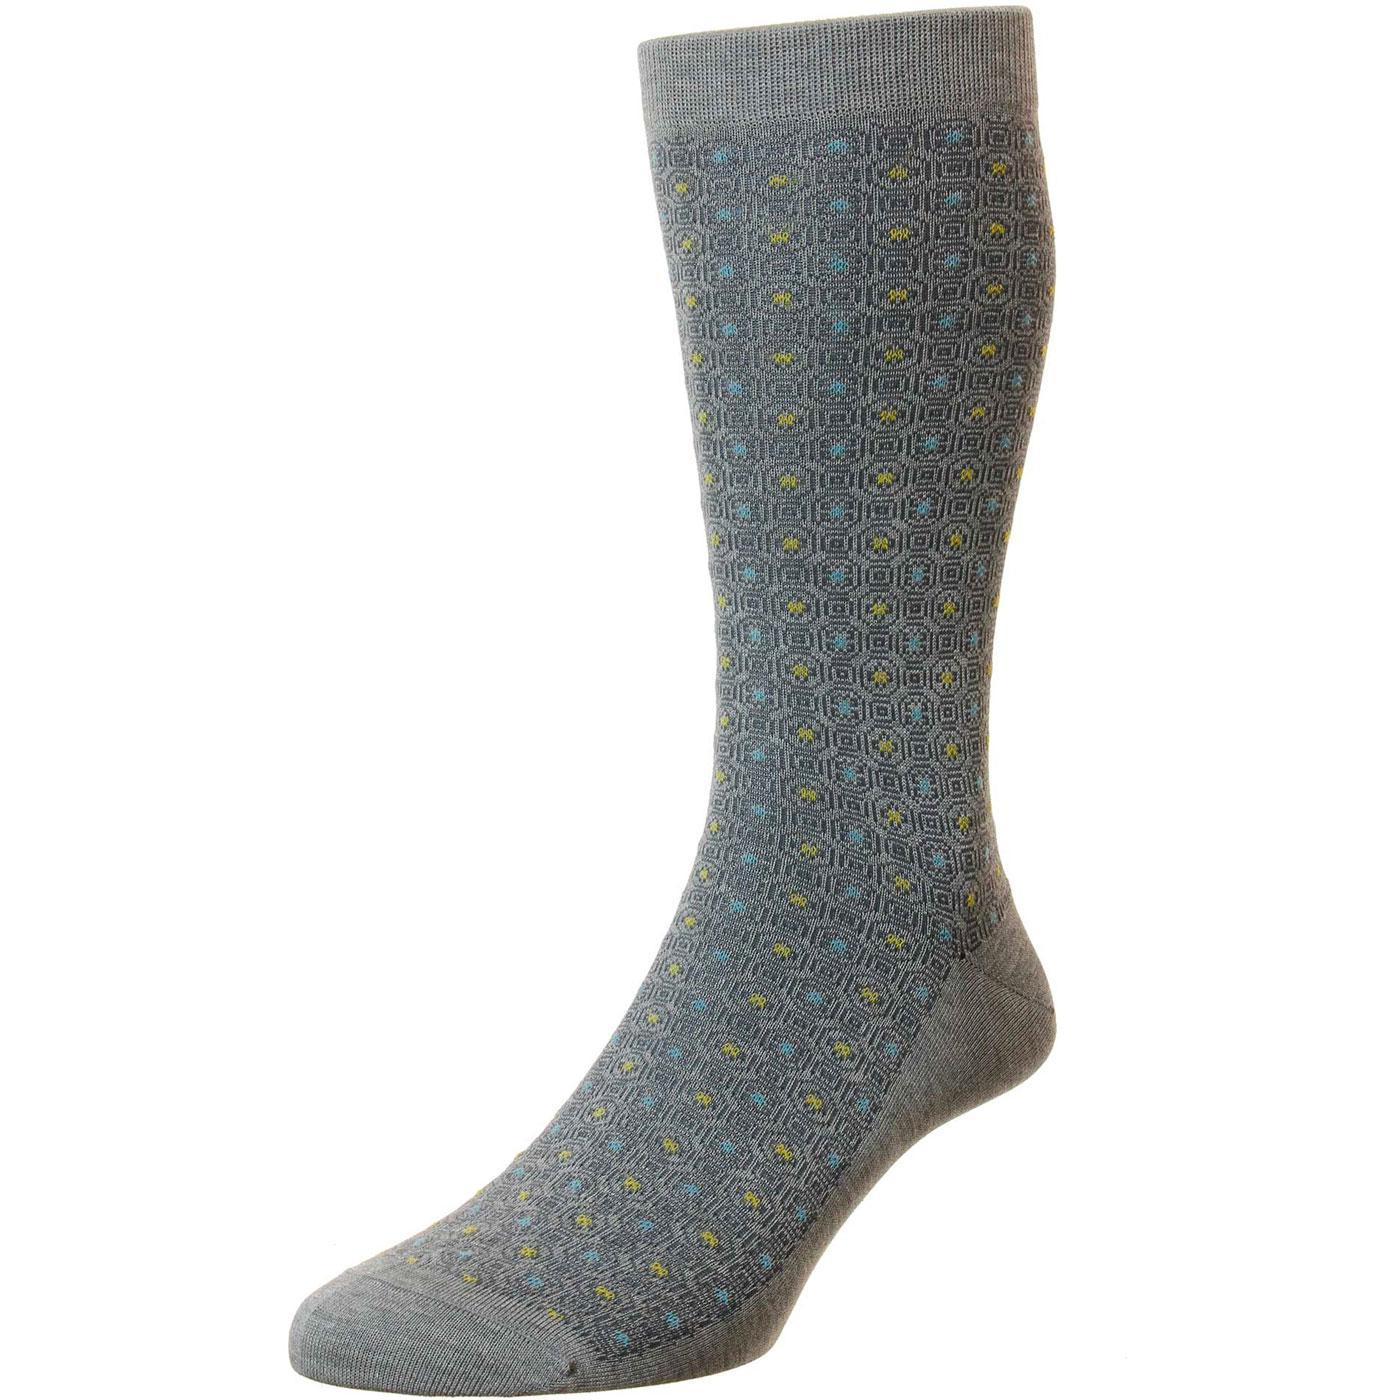 + Gilbert PANTHERELLA Mosaic Made in England Socks